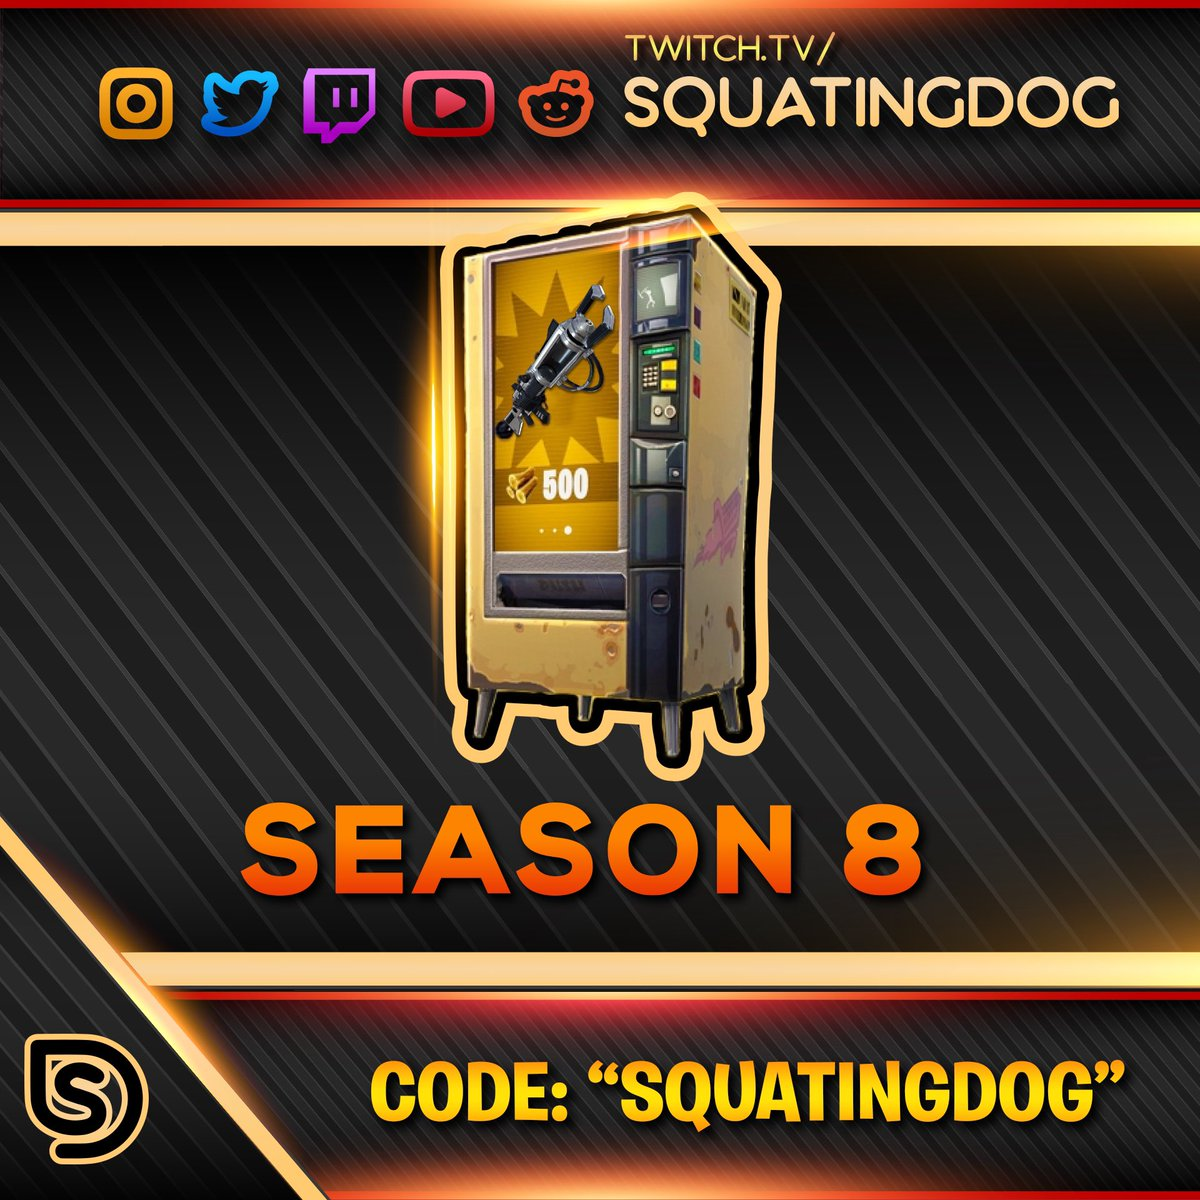 squatingdog on Twitter: